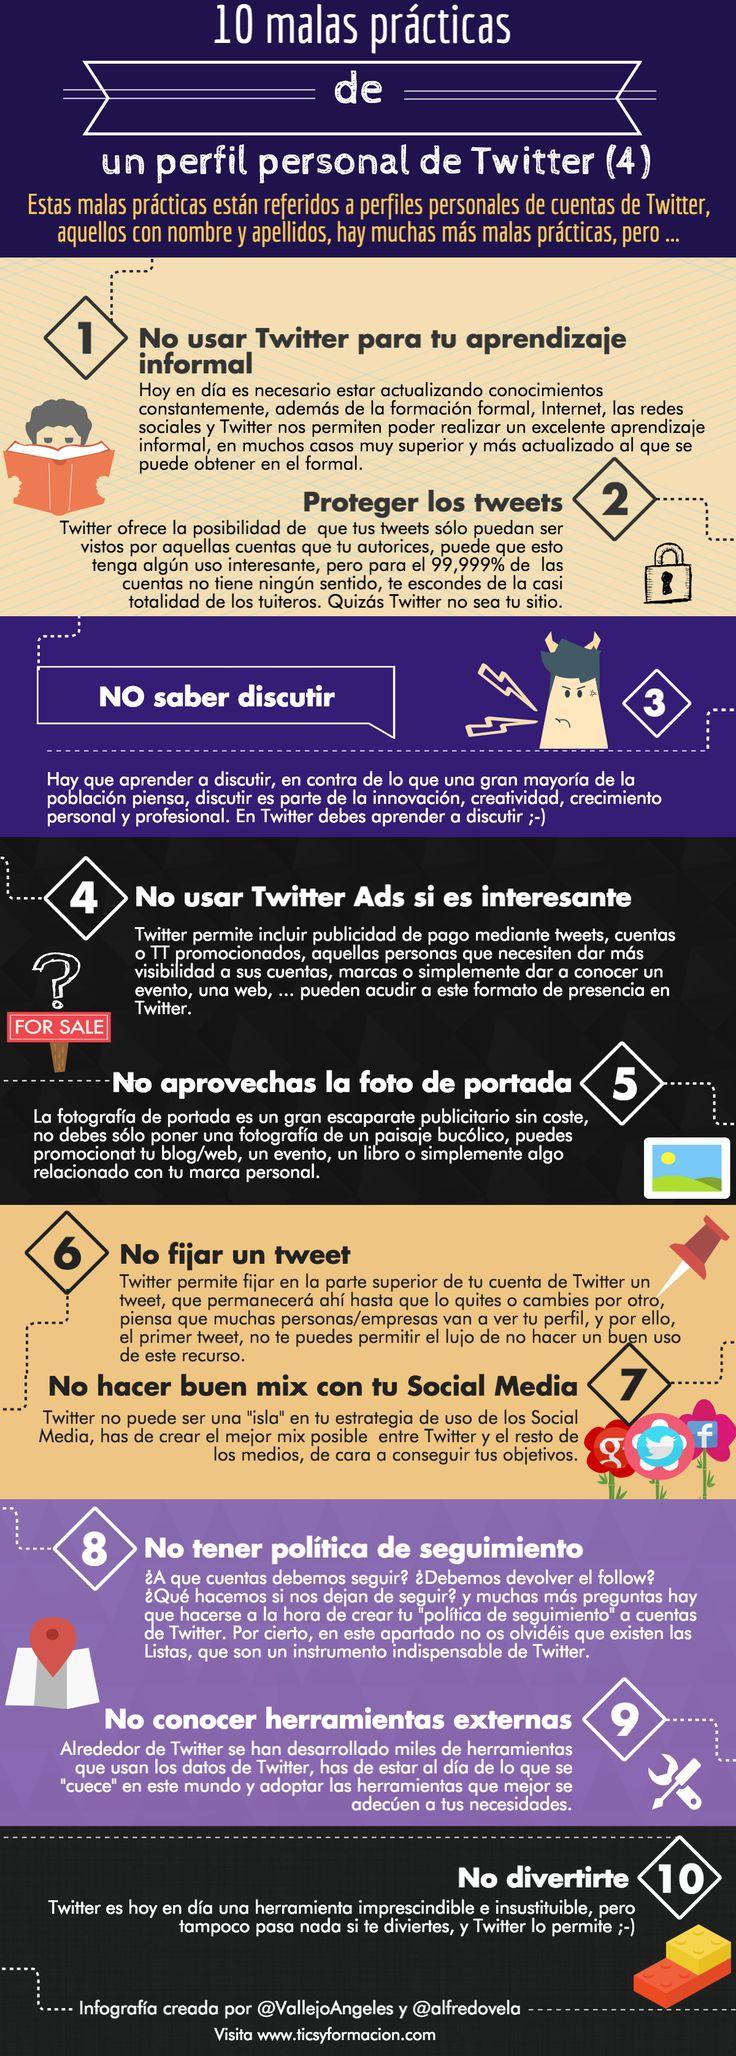 10 malas prácticas de un perfil personal de Twitter (IV). #infografia